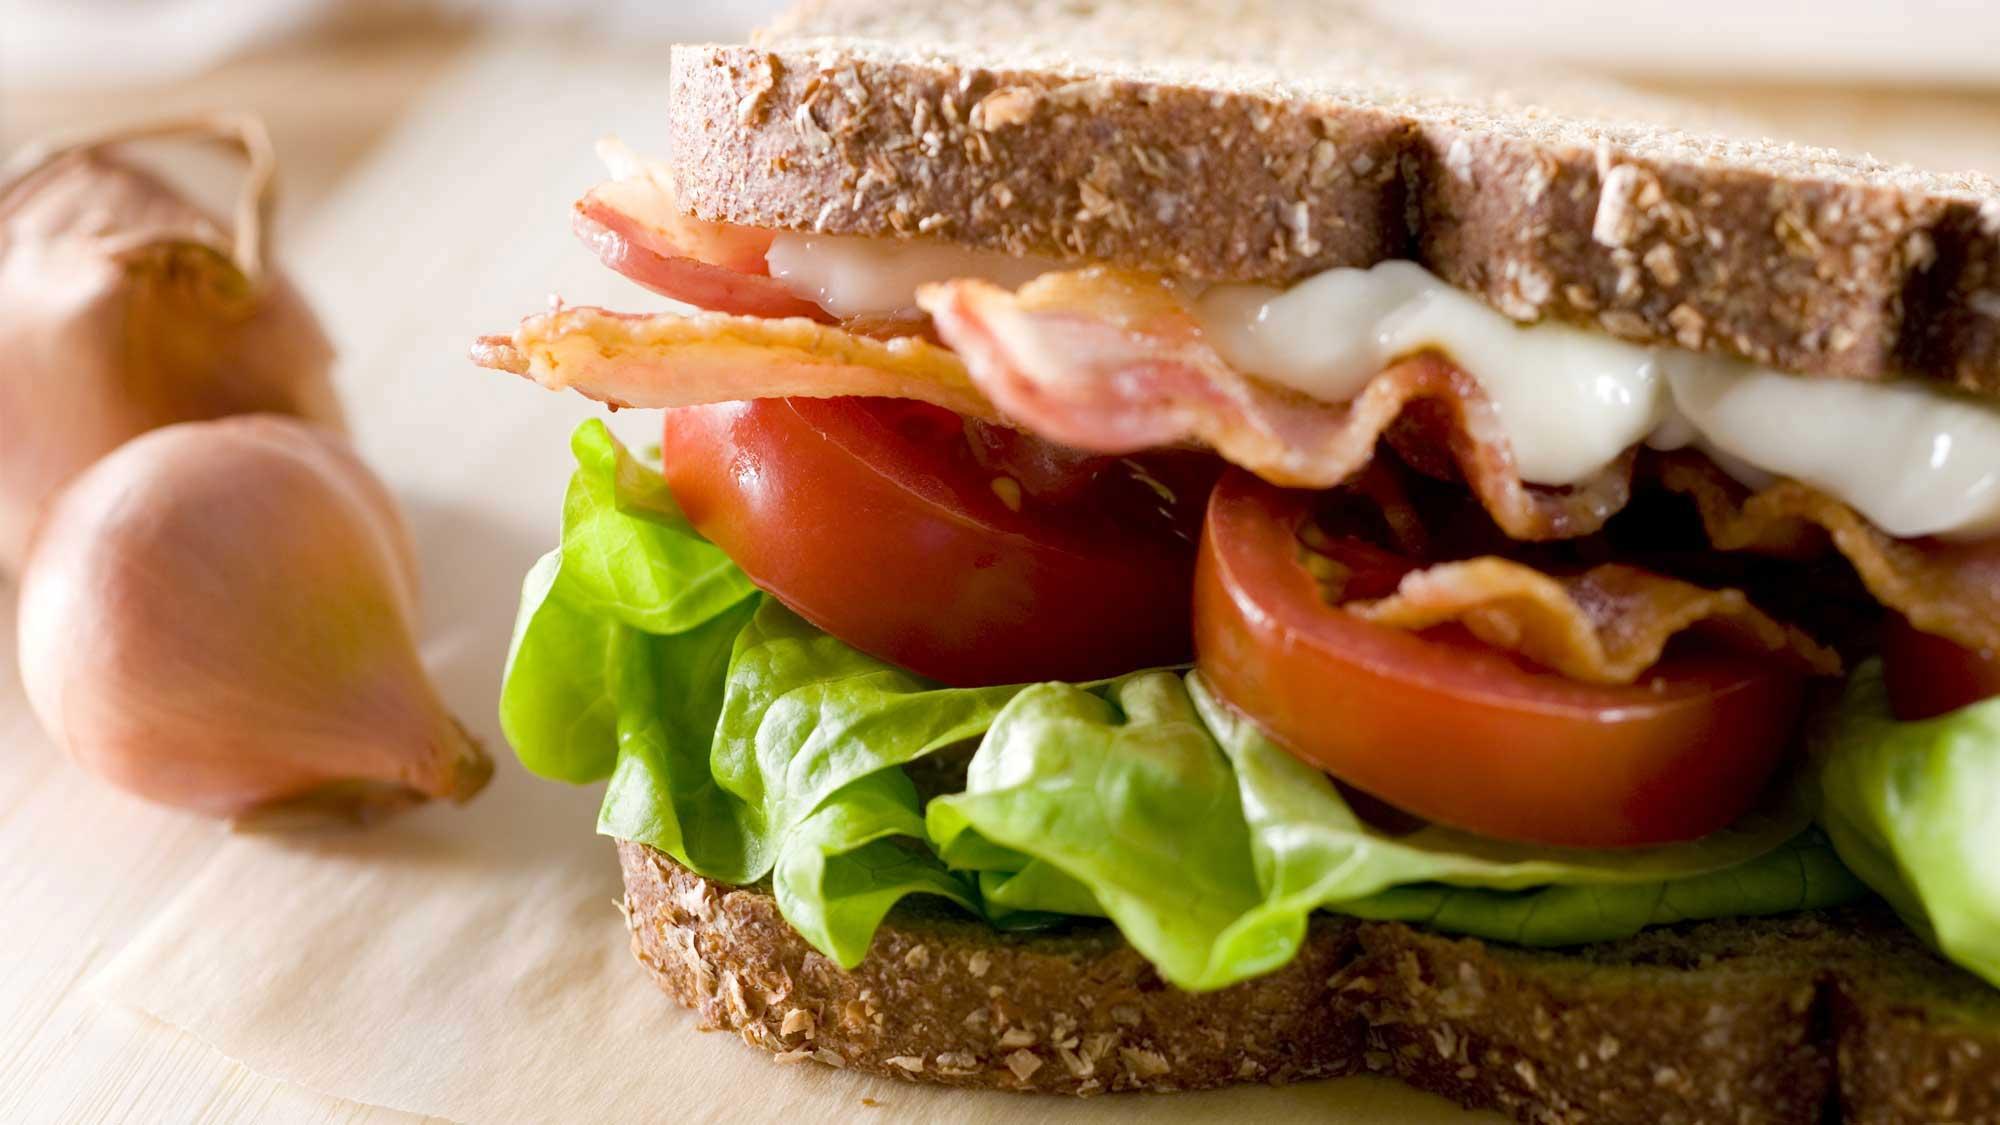 Sandwich with mayonnaise